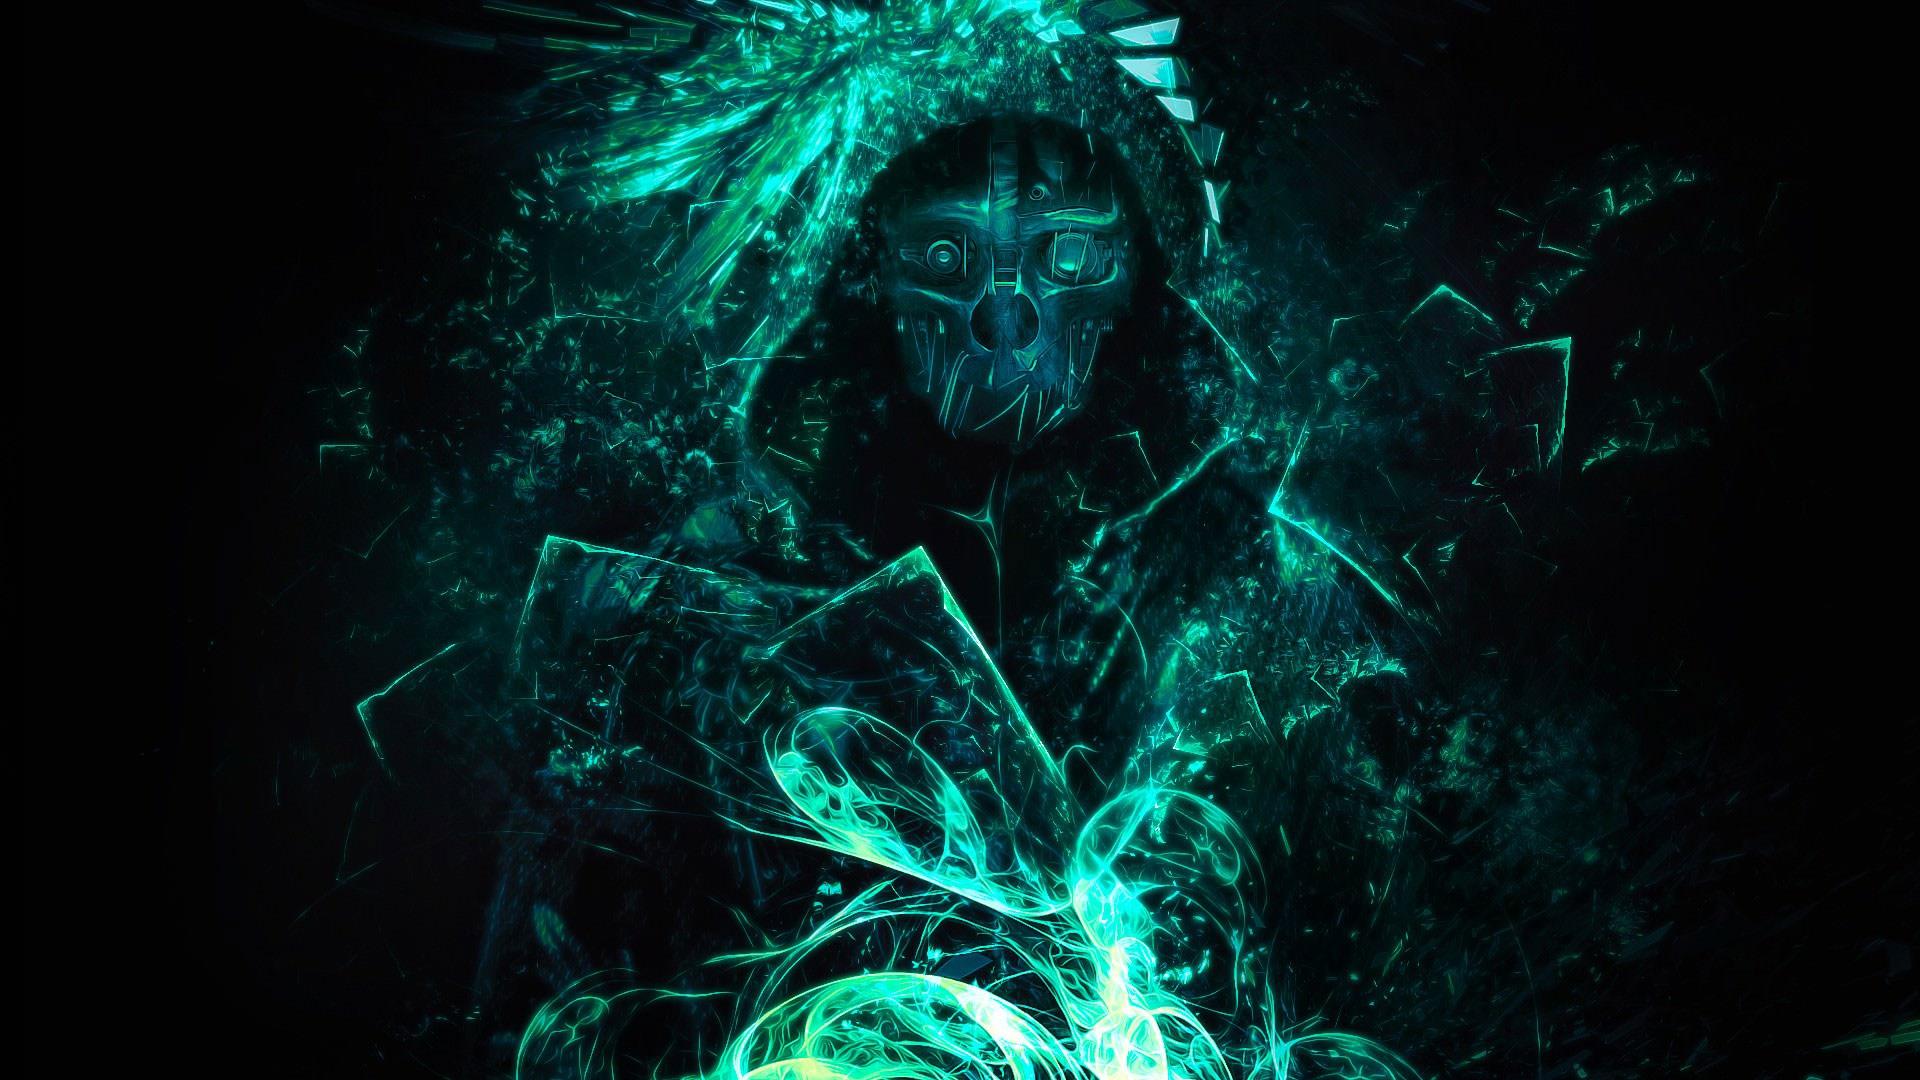 Dishonored 2 4K Wallpaper | Dishonored 2 1080p Wallpaper …